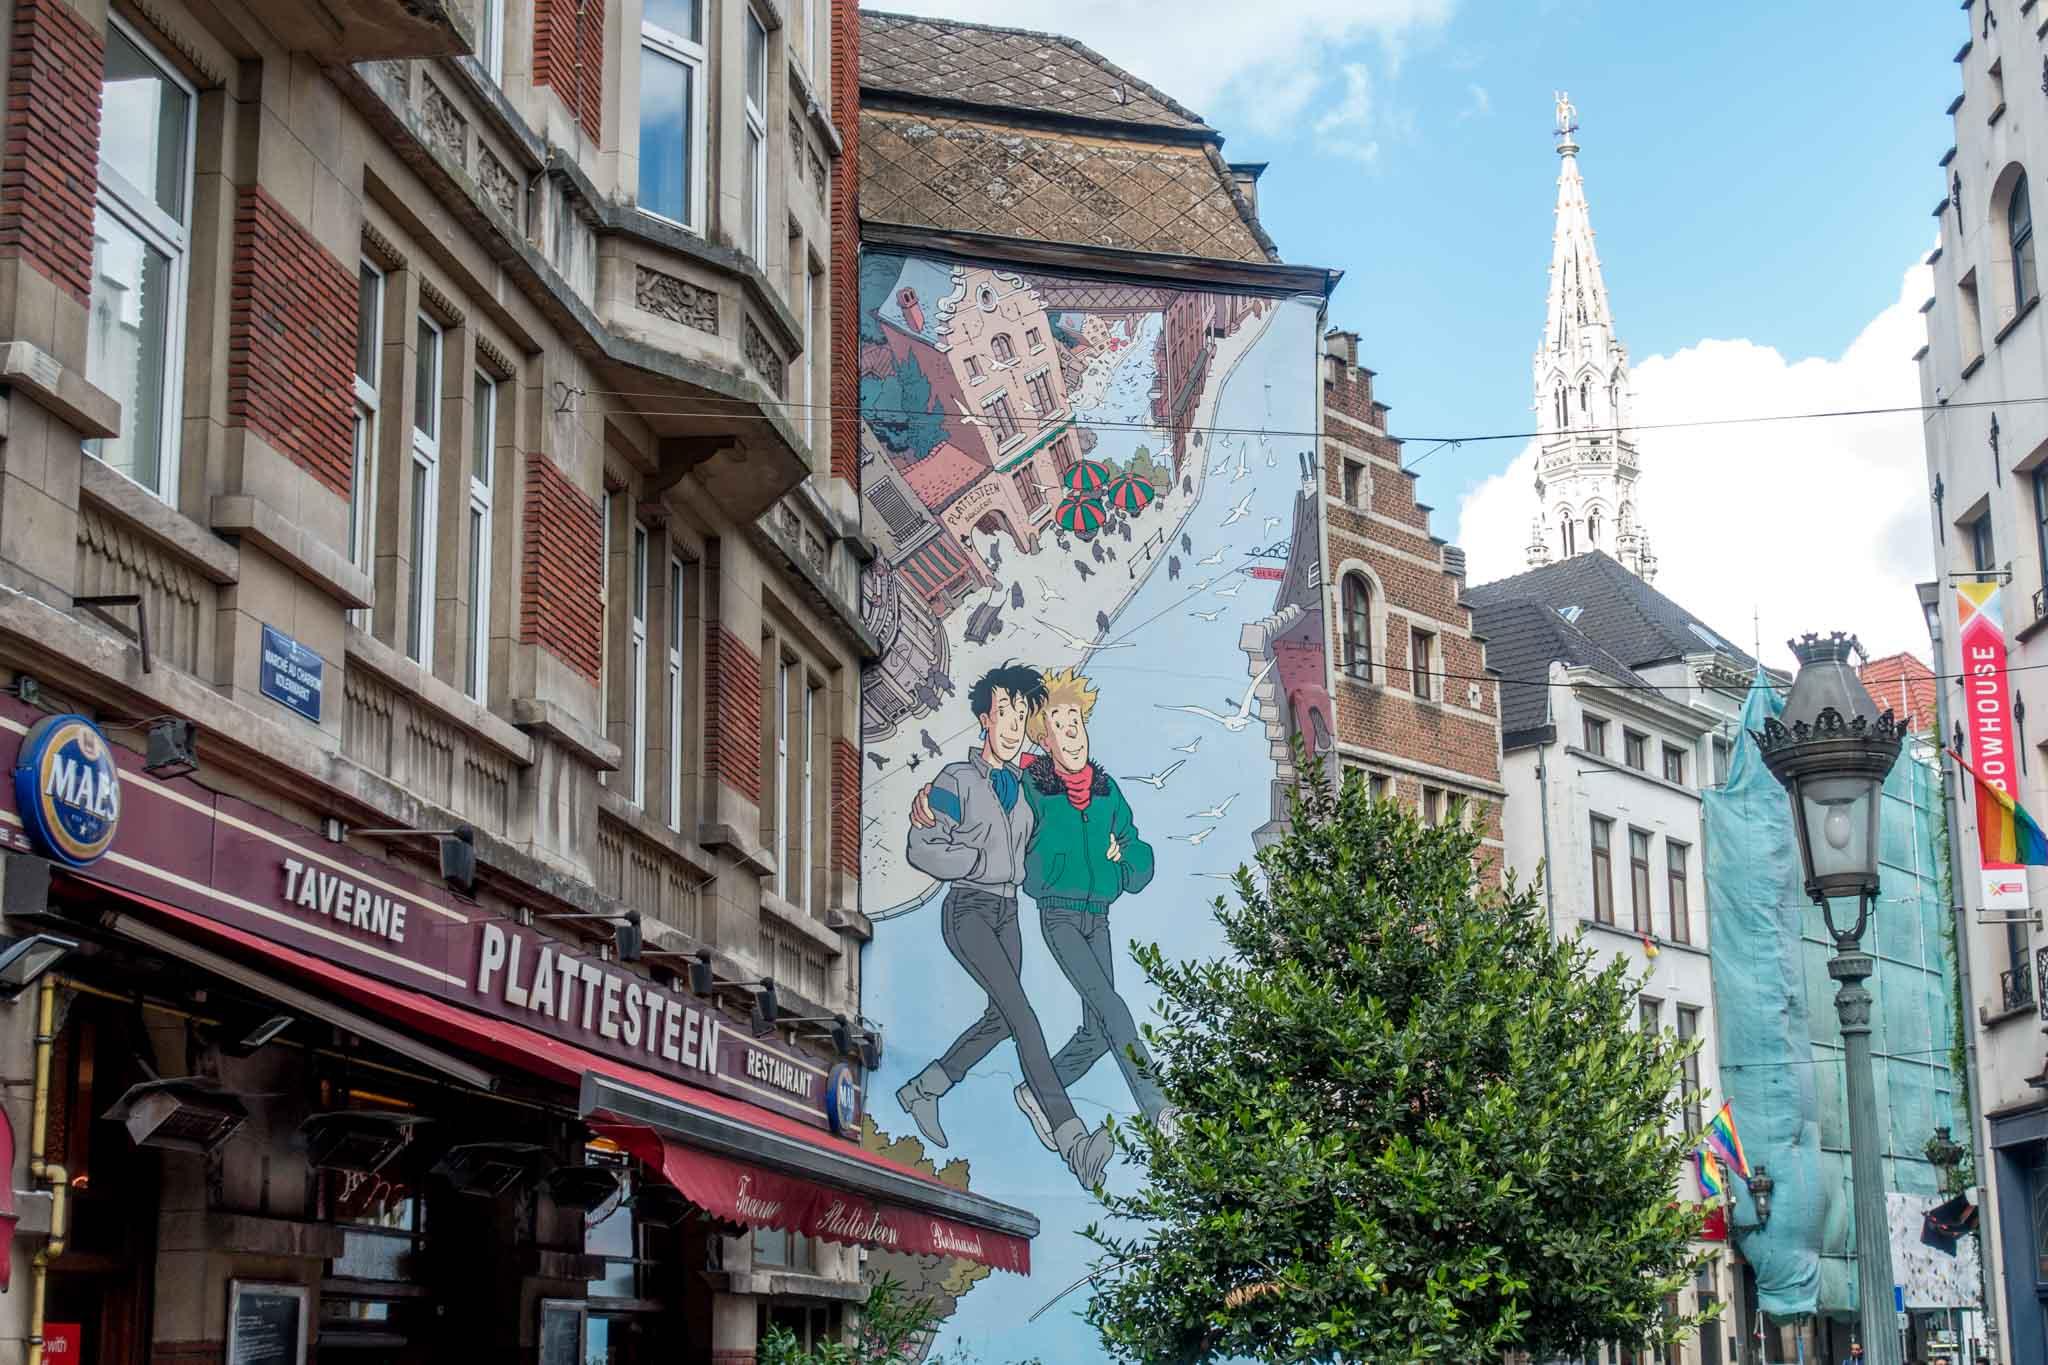 Street art mural of couple walking down the street in Brussels